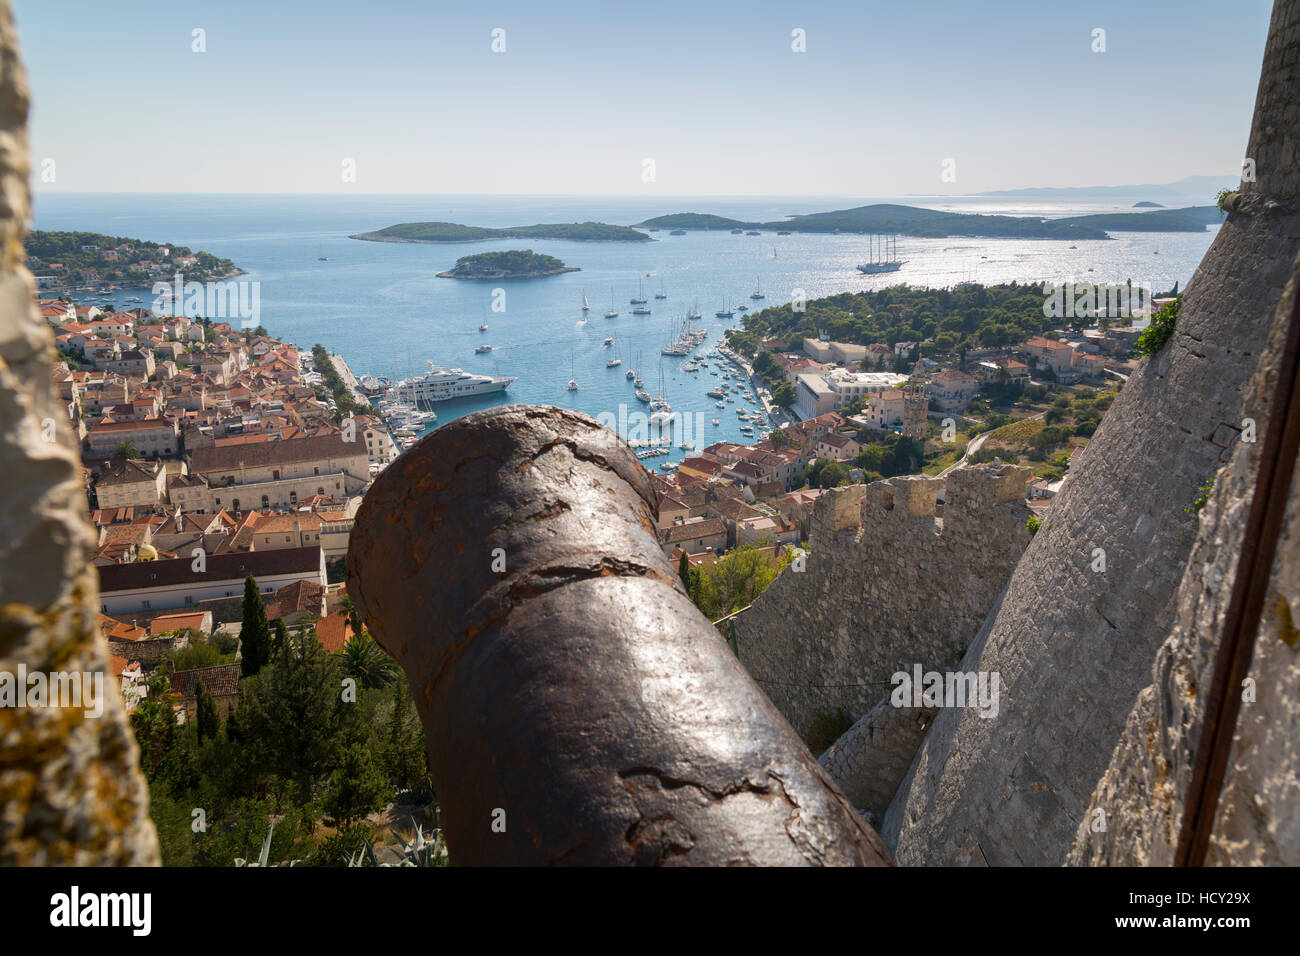 View over Hvar from Spanish Fortress, Hvar Island, Dalmatia, Croatia - Stock Image